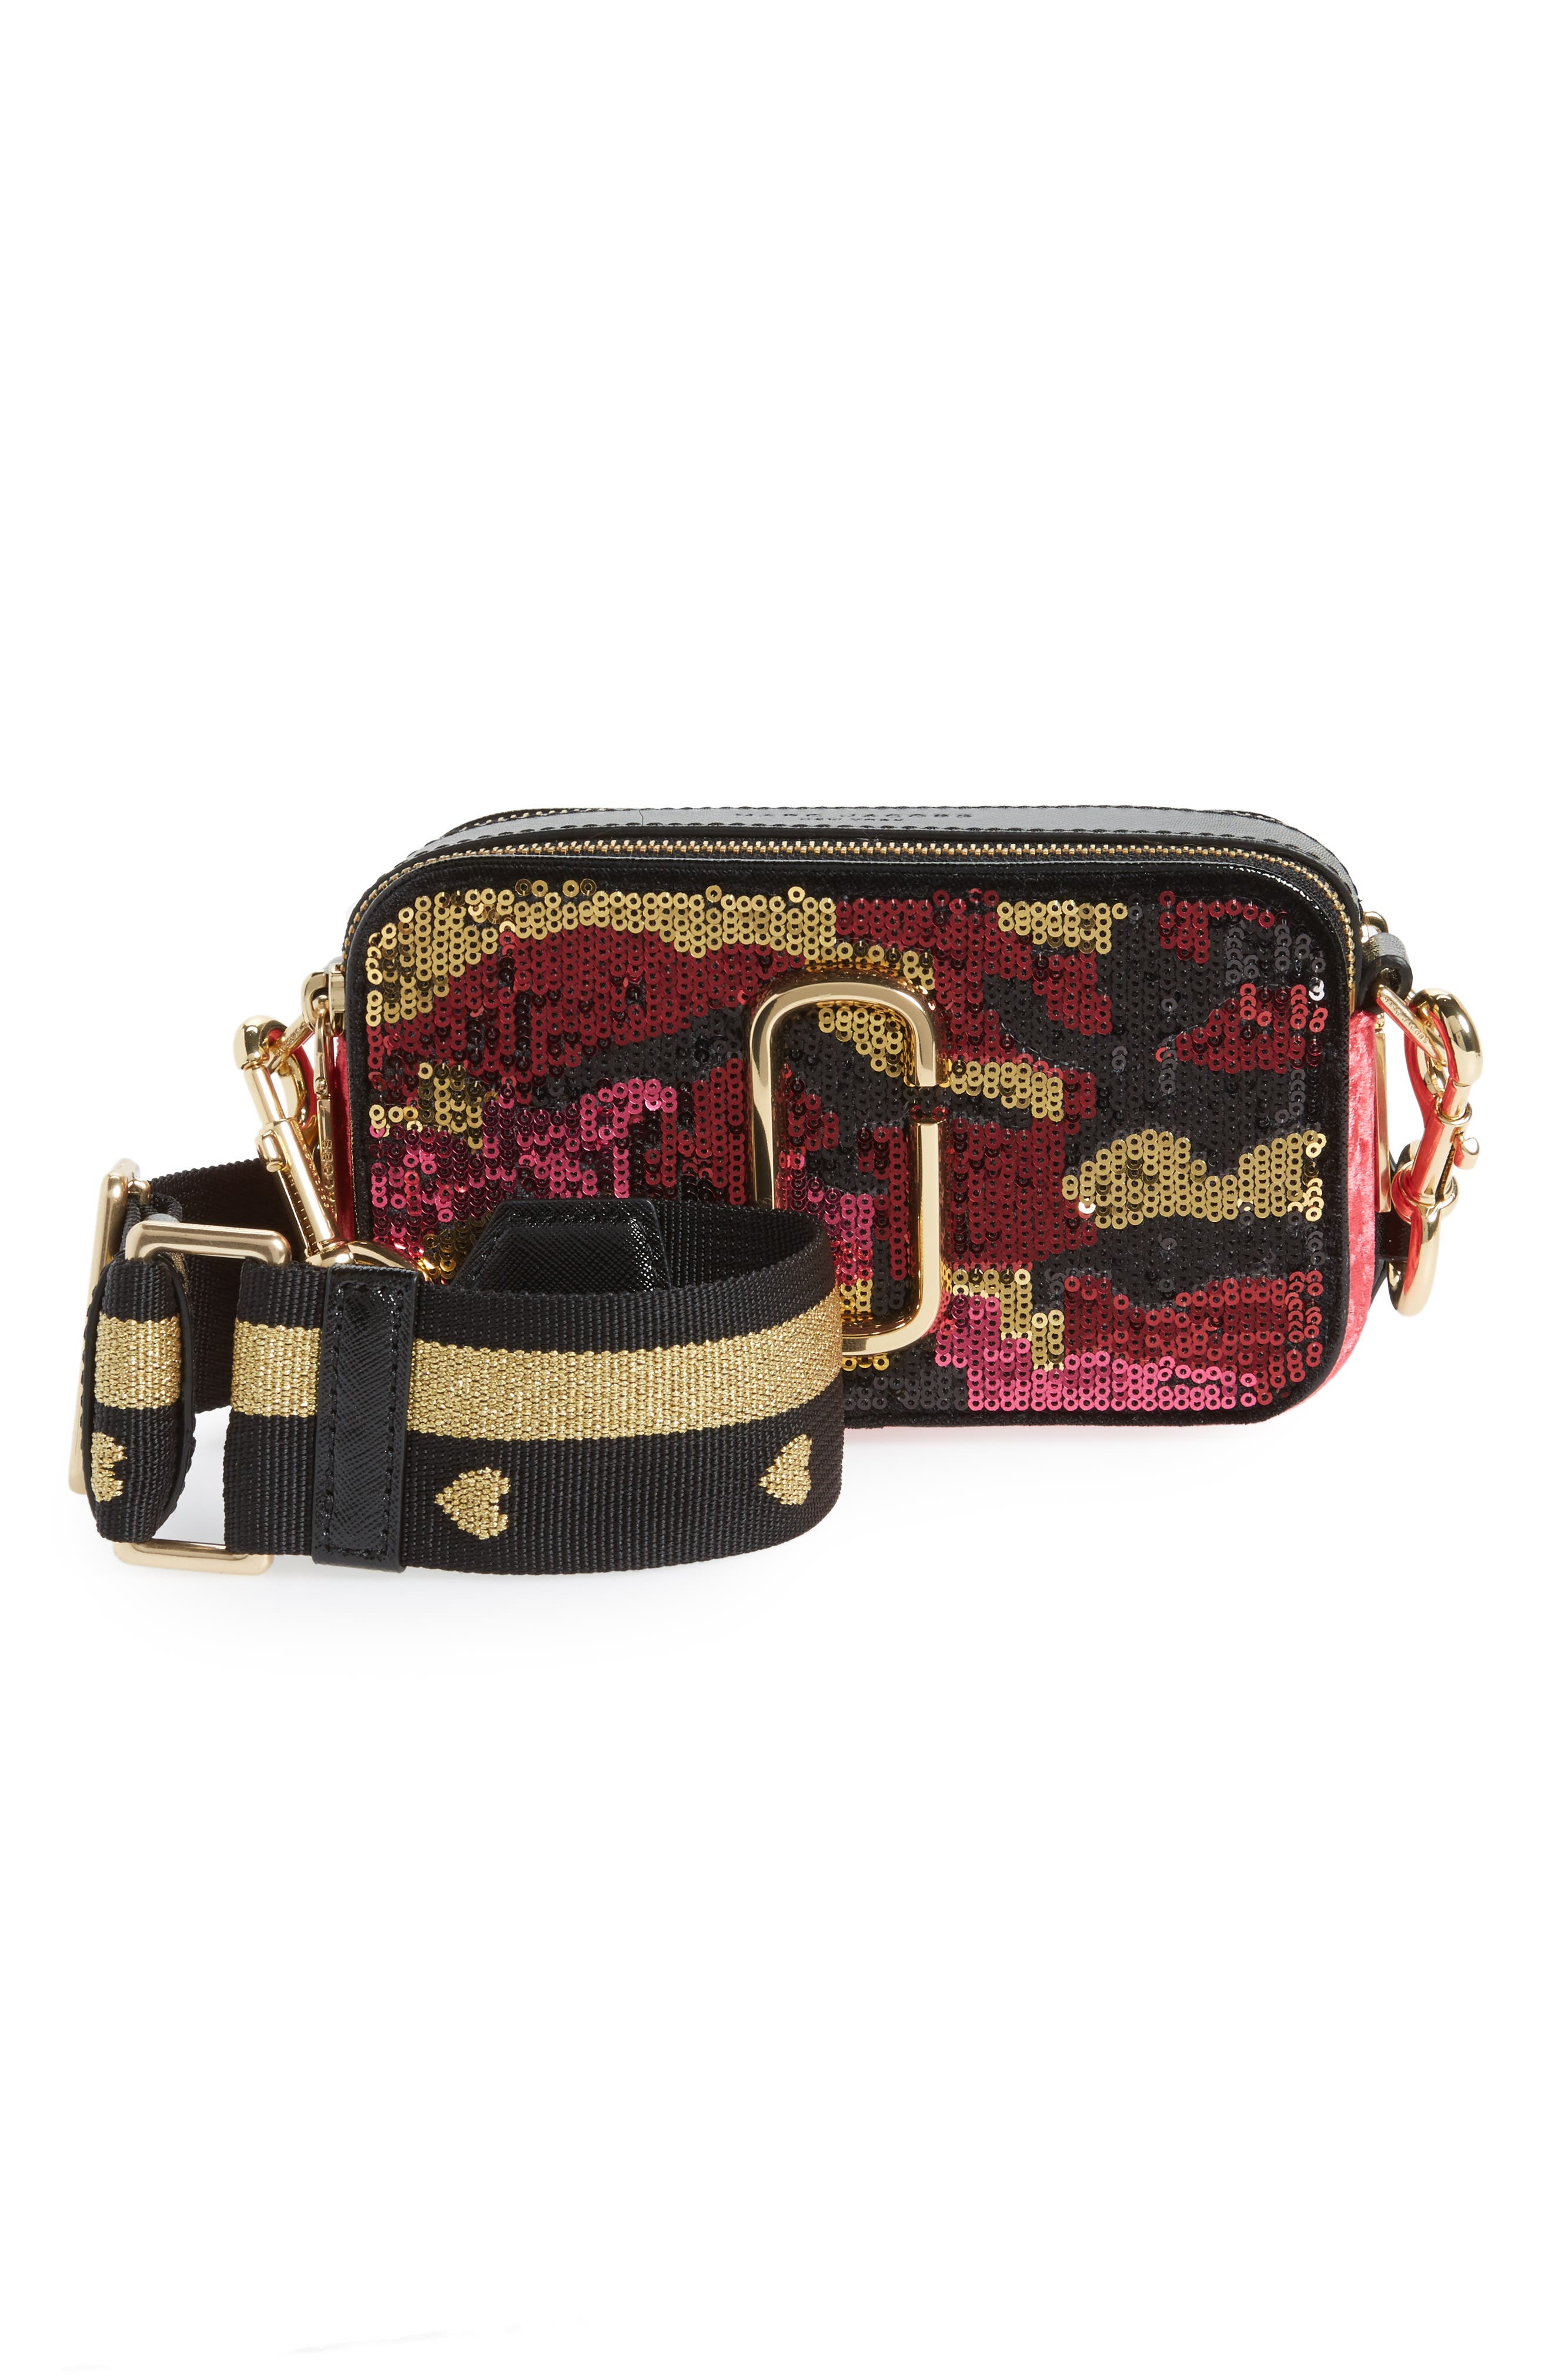 Snapshot Camo Sequin Embellished Crossbody Bag,                             Main thumbnail 1, color,                             PINK MULTI